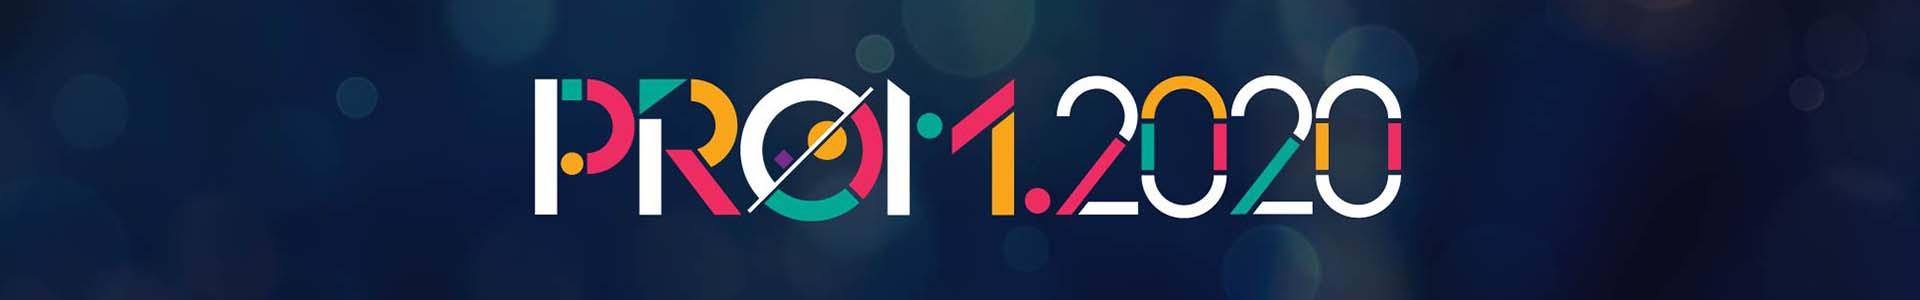 Prom 2020 header image